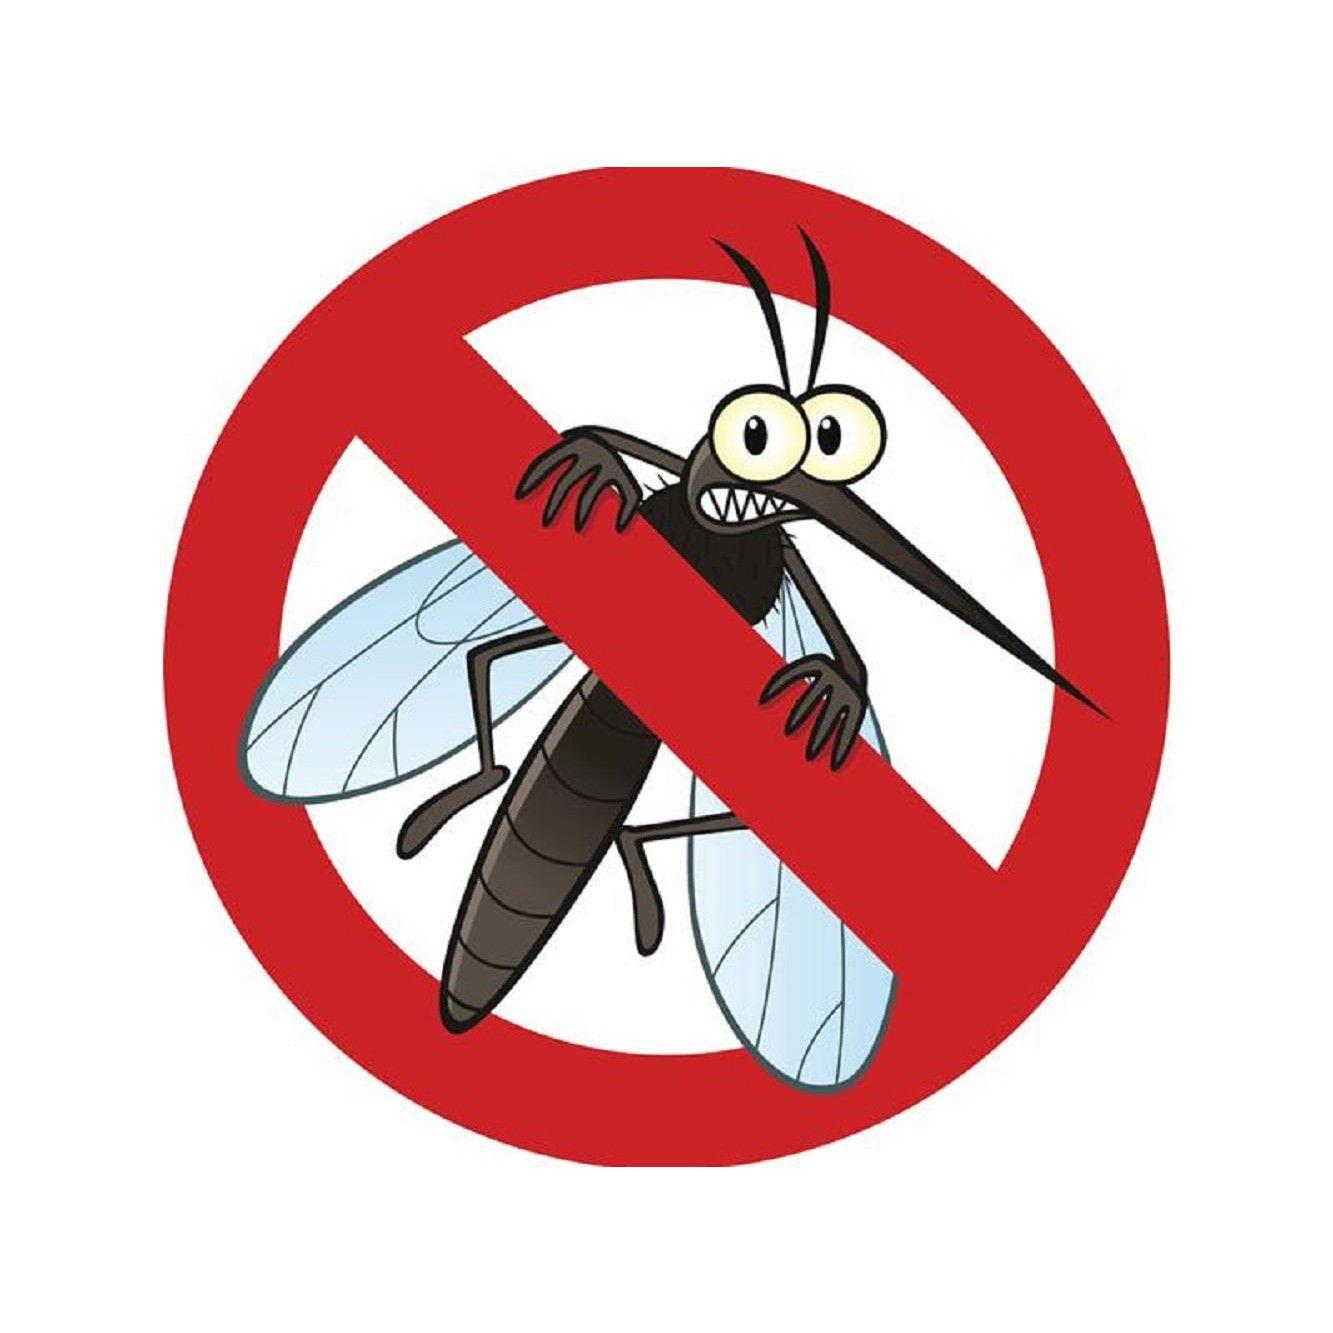 Repelente de Mosquitos Sonoro da Primo Passi - Azul